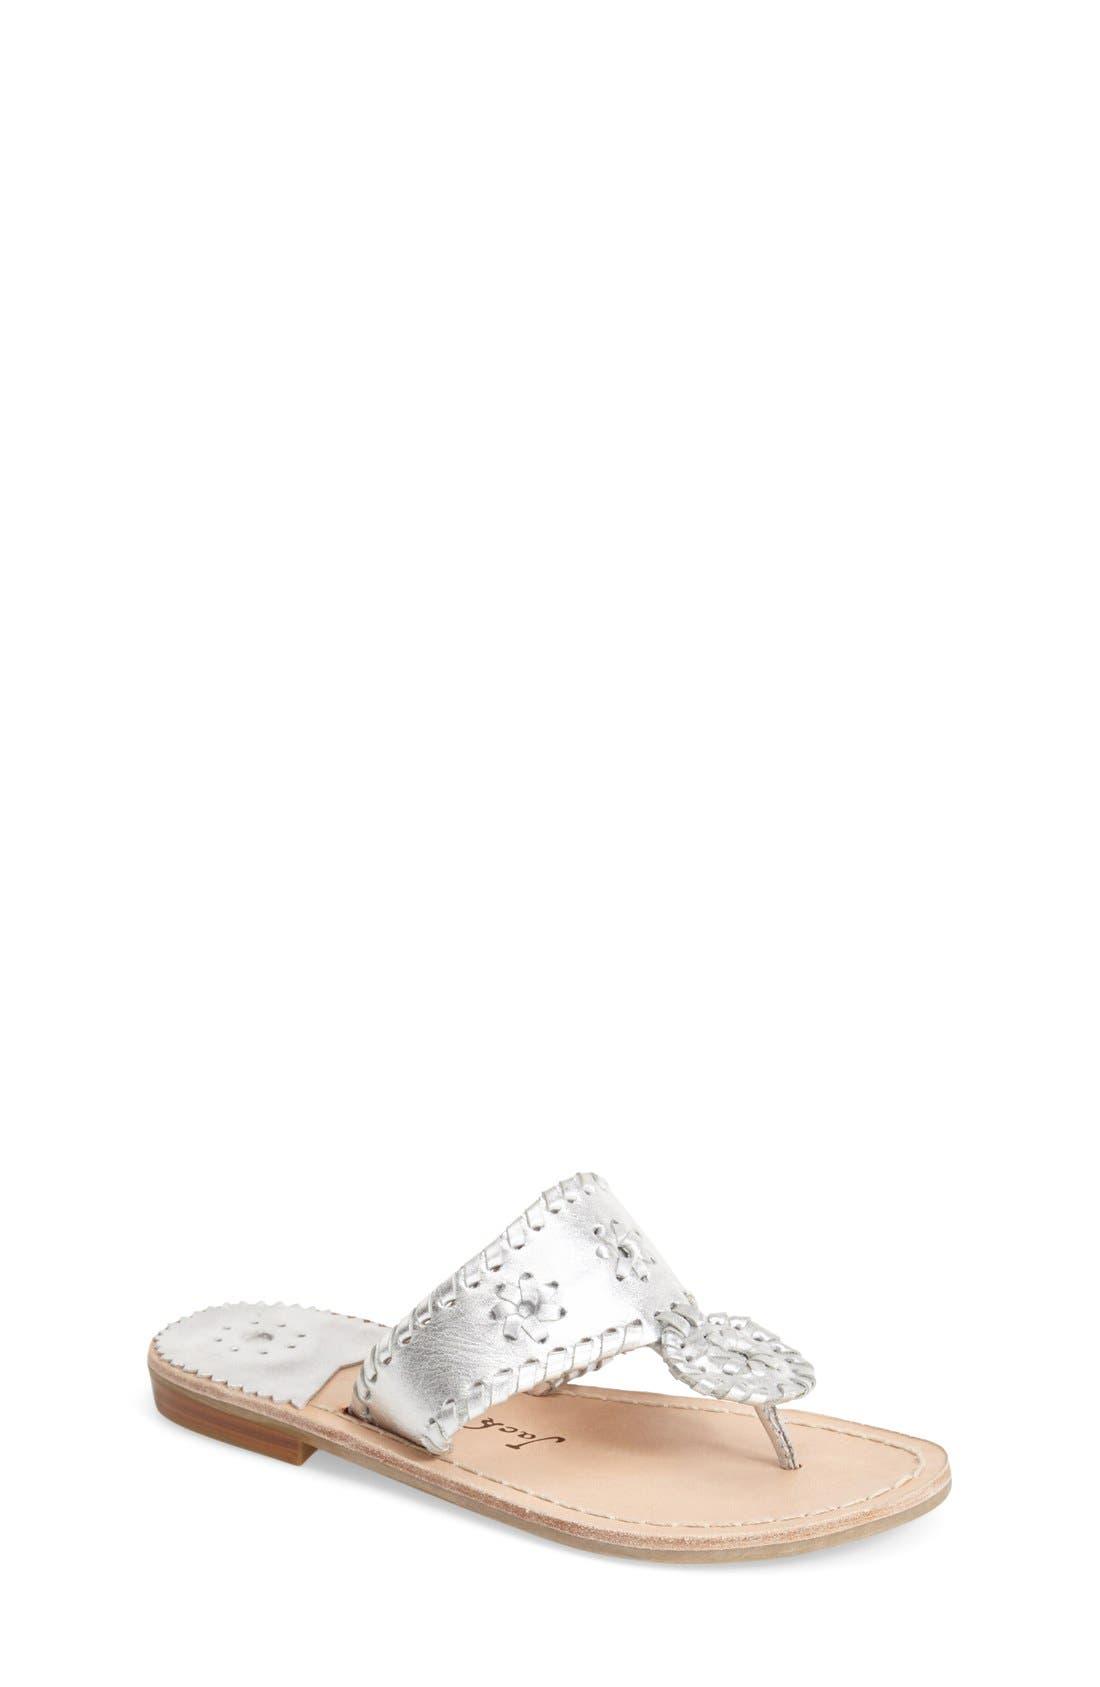 JACK ROGERS 'Miss Hamptons' Sandal, Main, color, SILVER